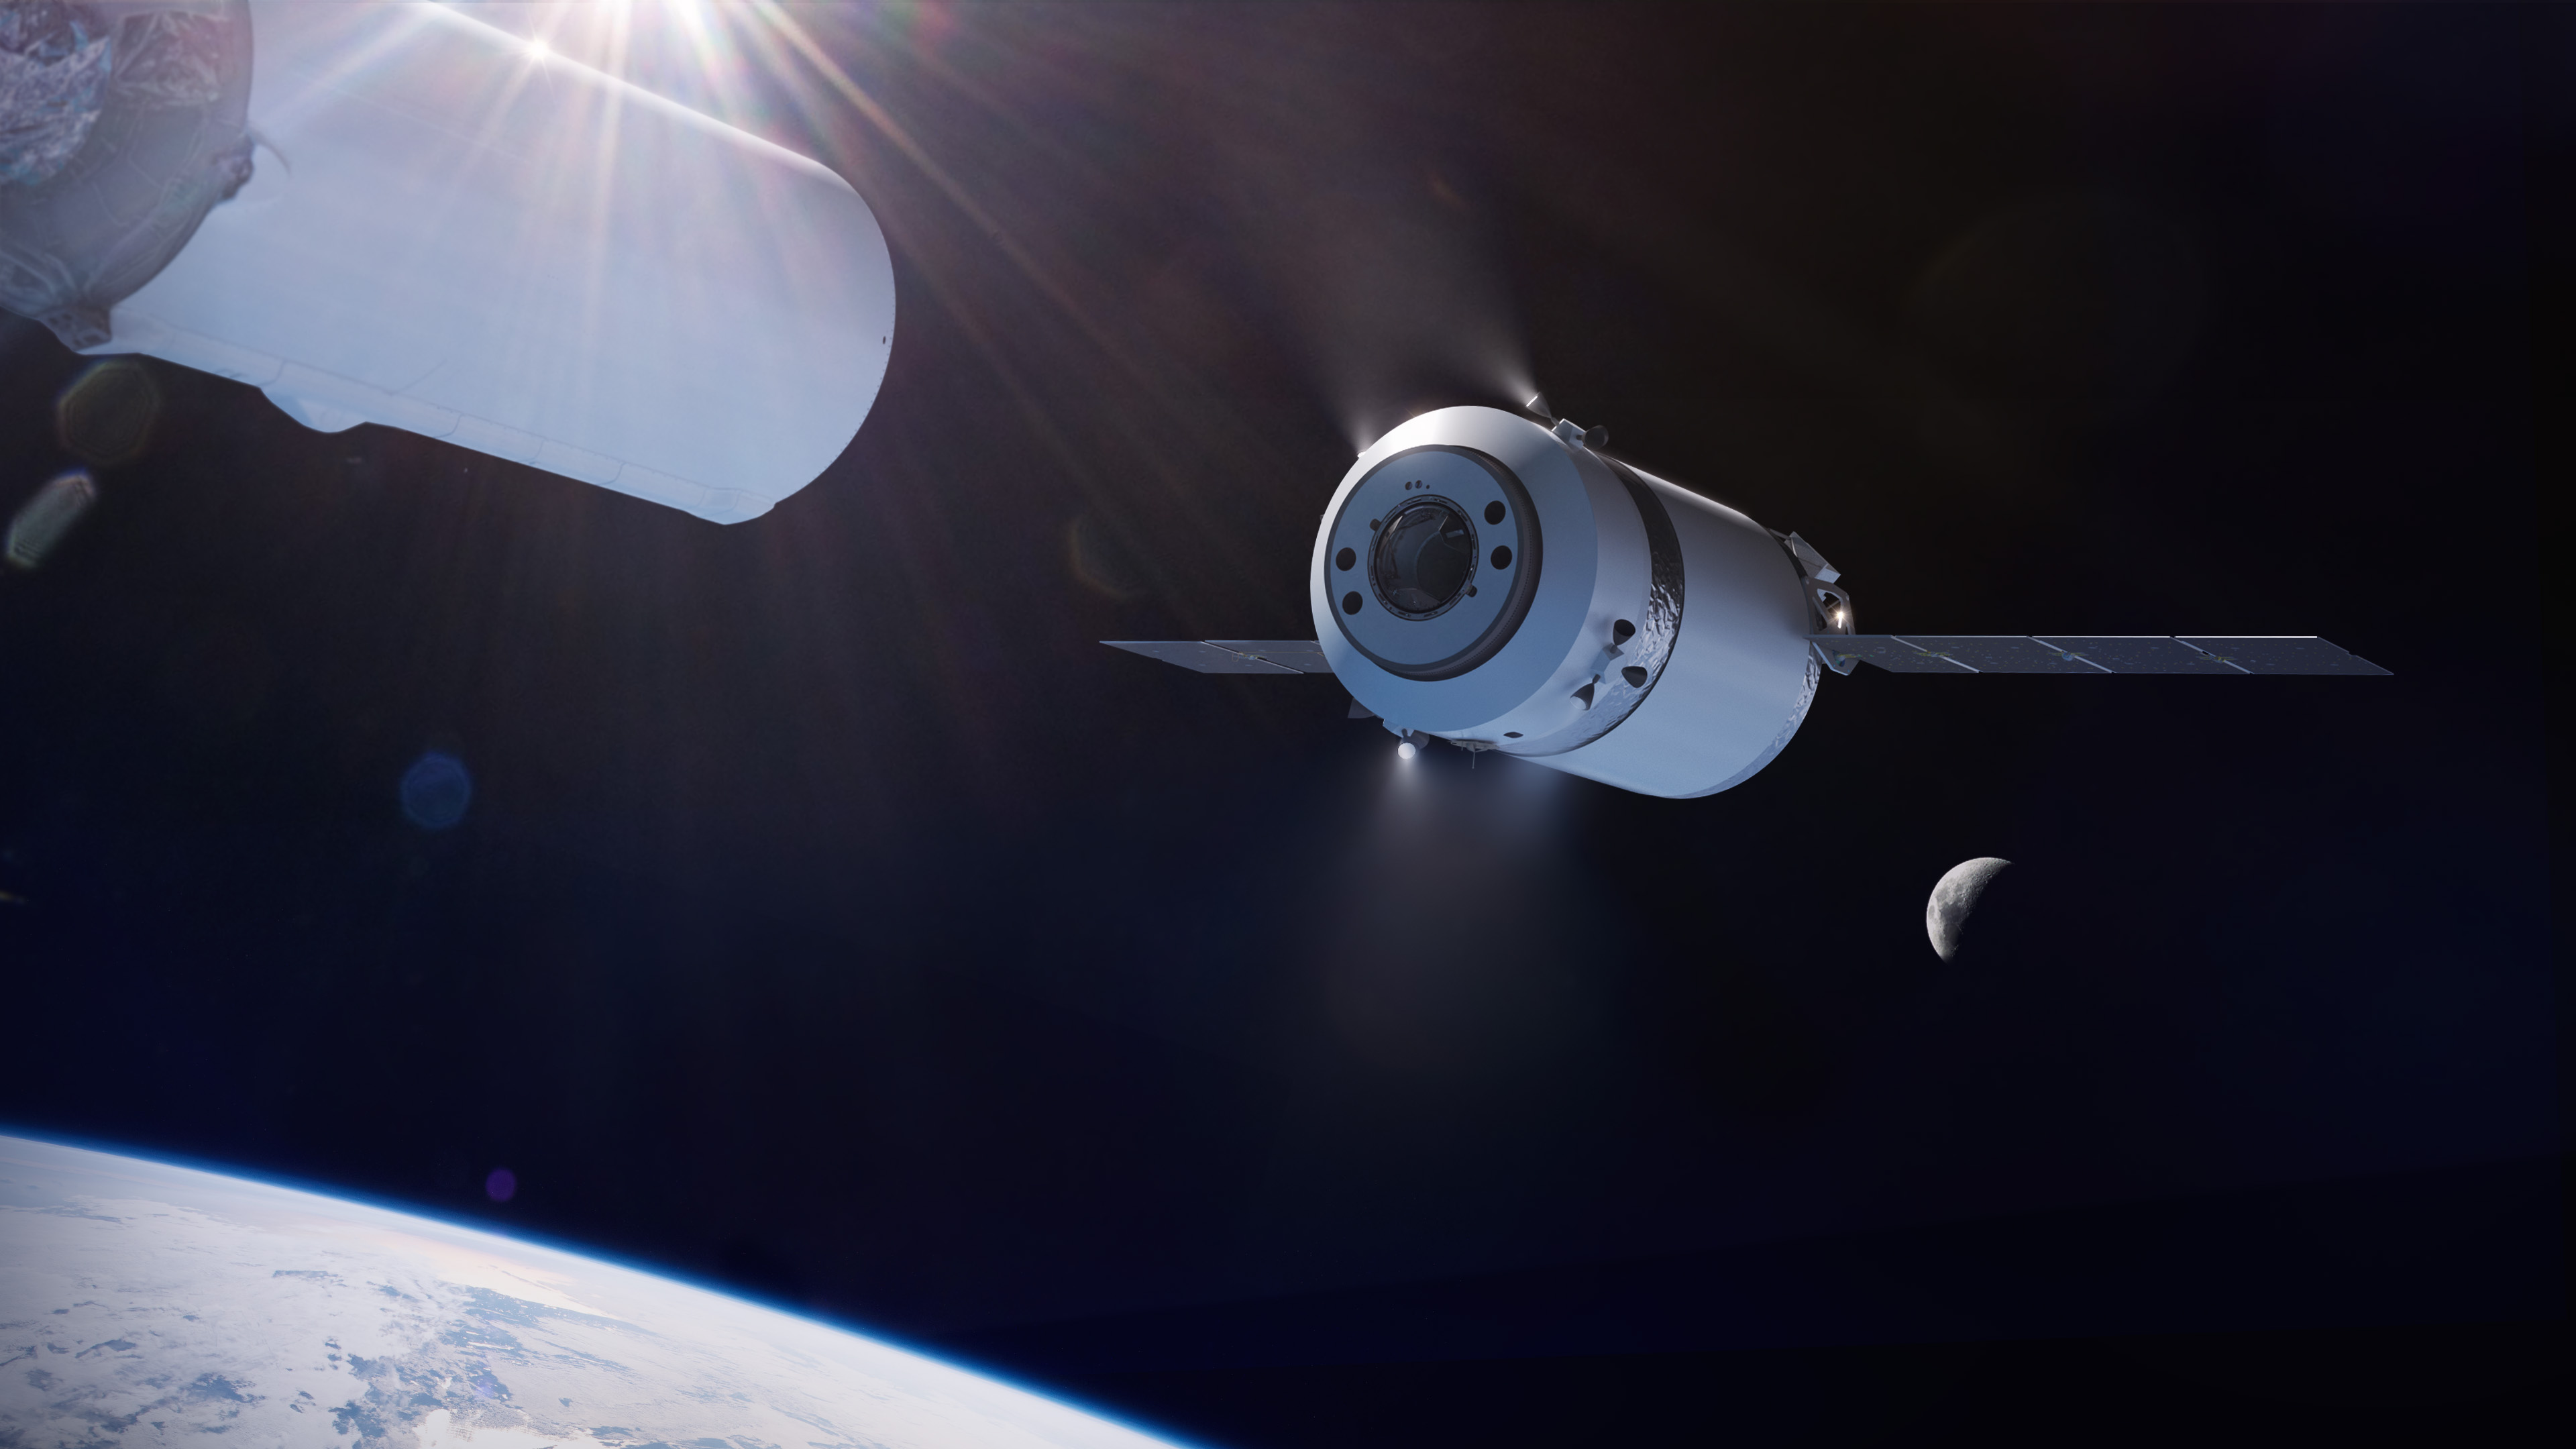 NASA contrata SpaceX para missão na órbita lunar